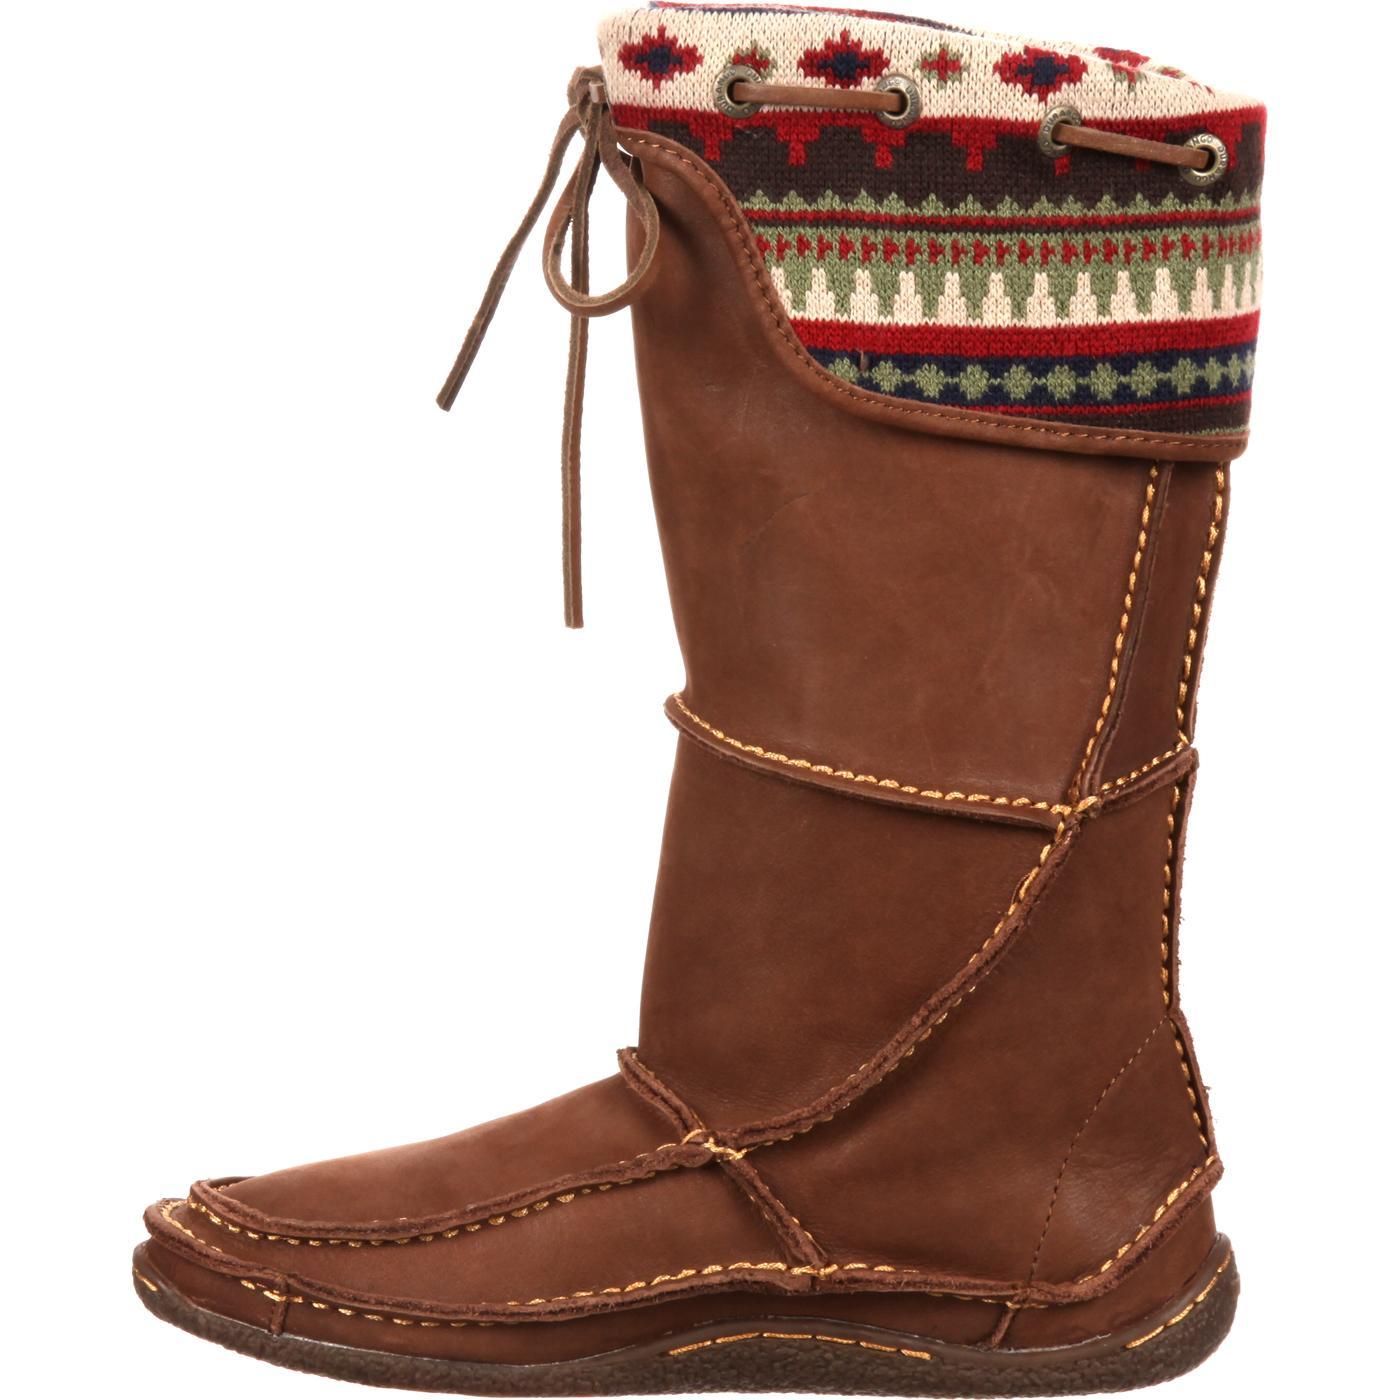 Durango City Santa Fe Women S Tall Moccasin Boots Style